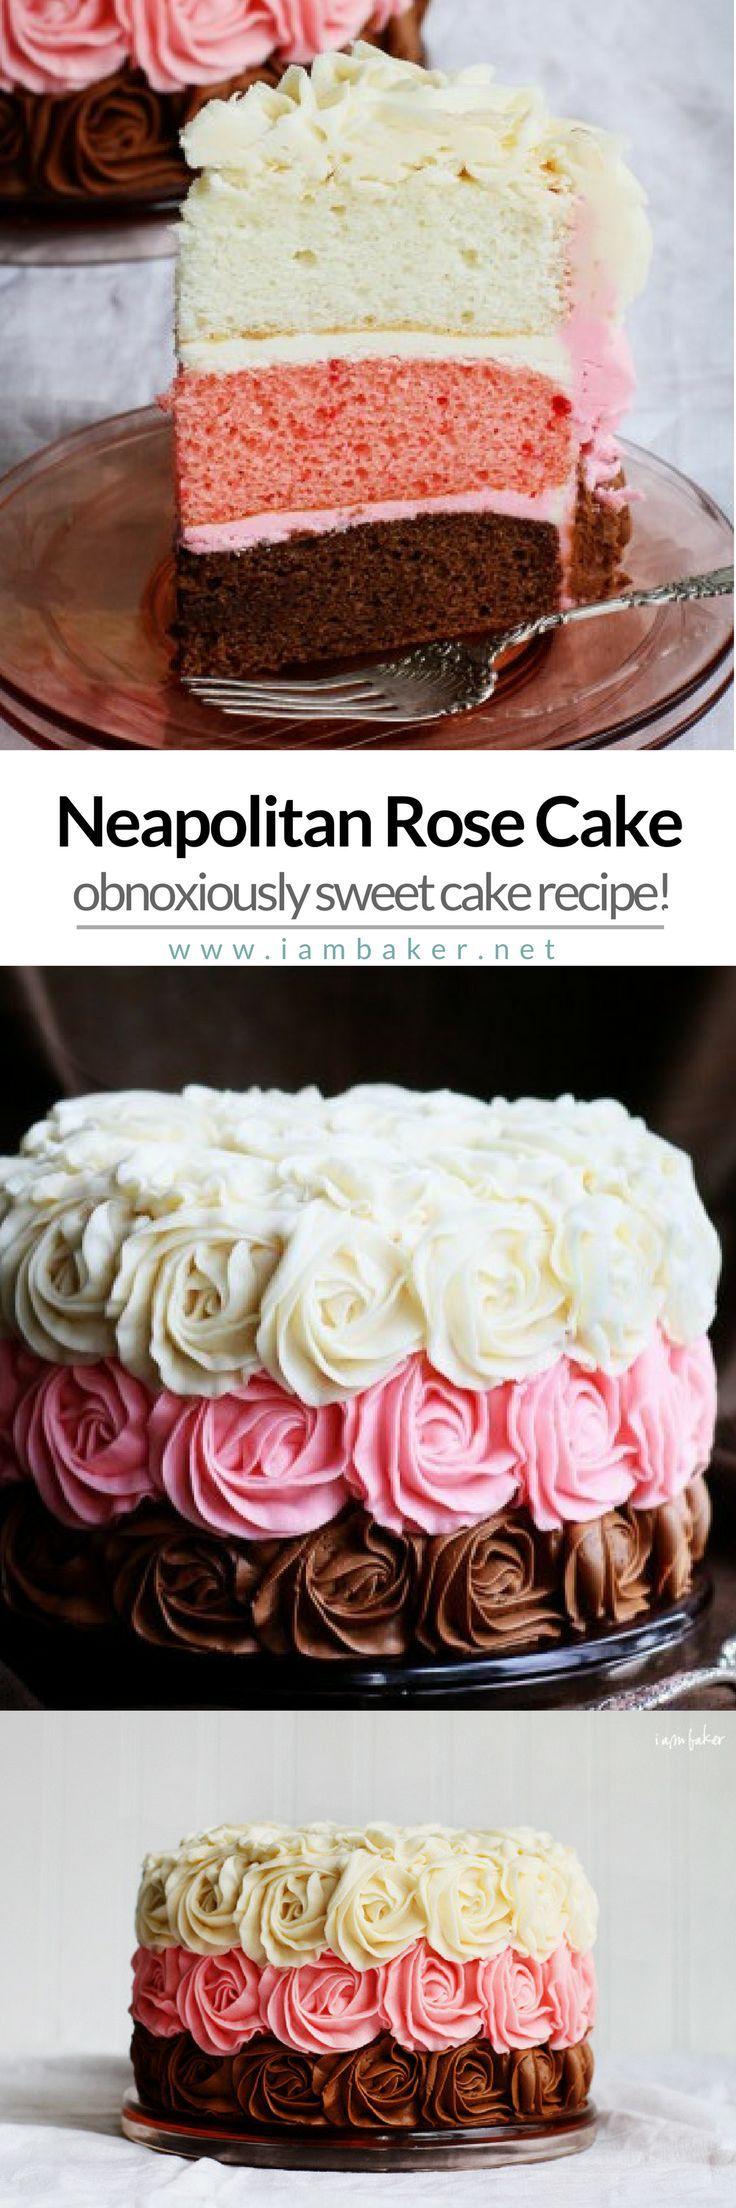 NEAPOLITAN ROSE CAKE | Posted By: DebbieNet.com